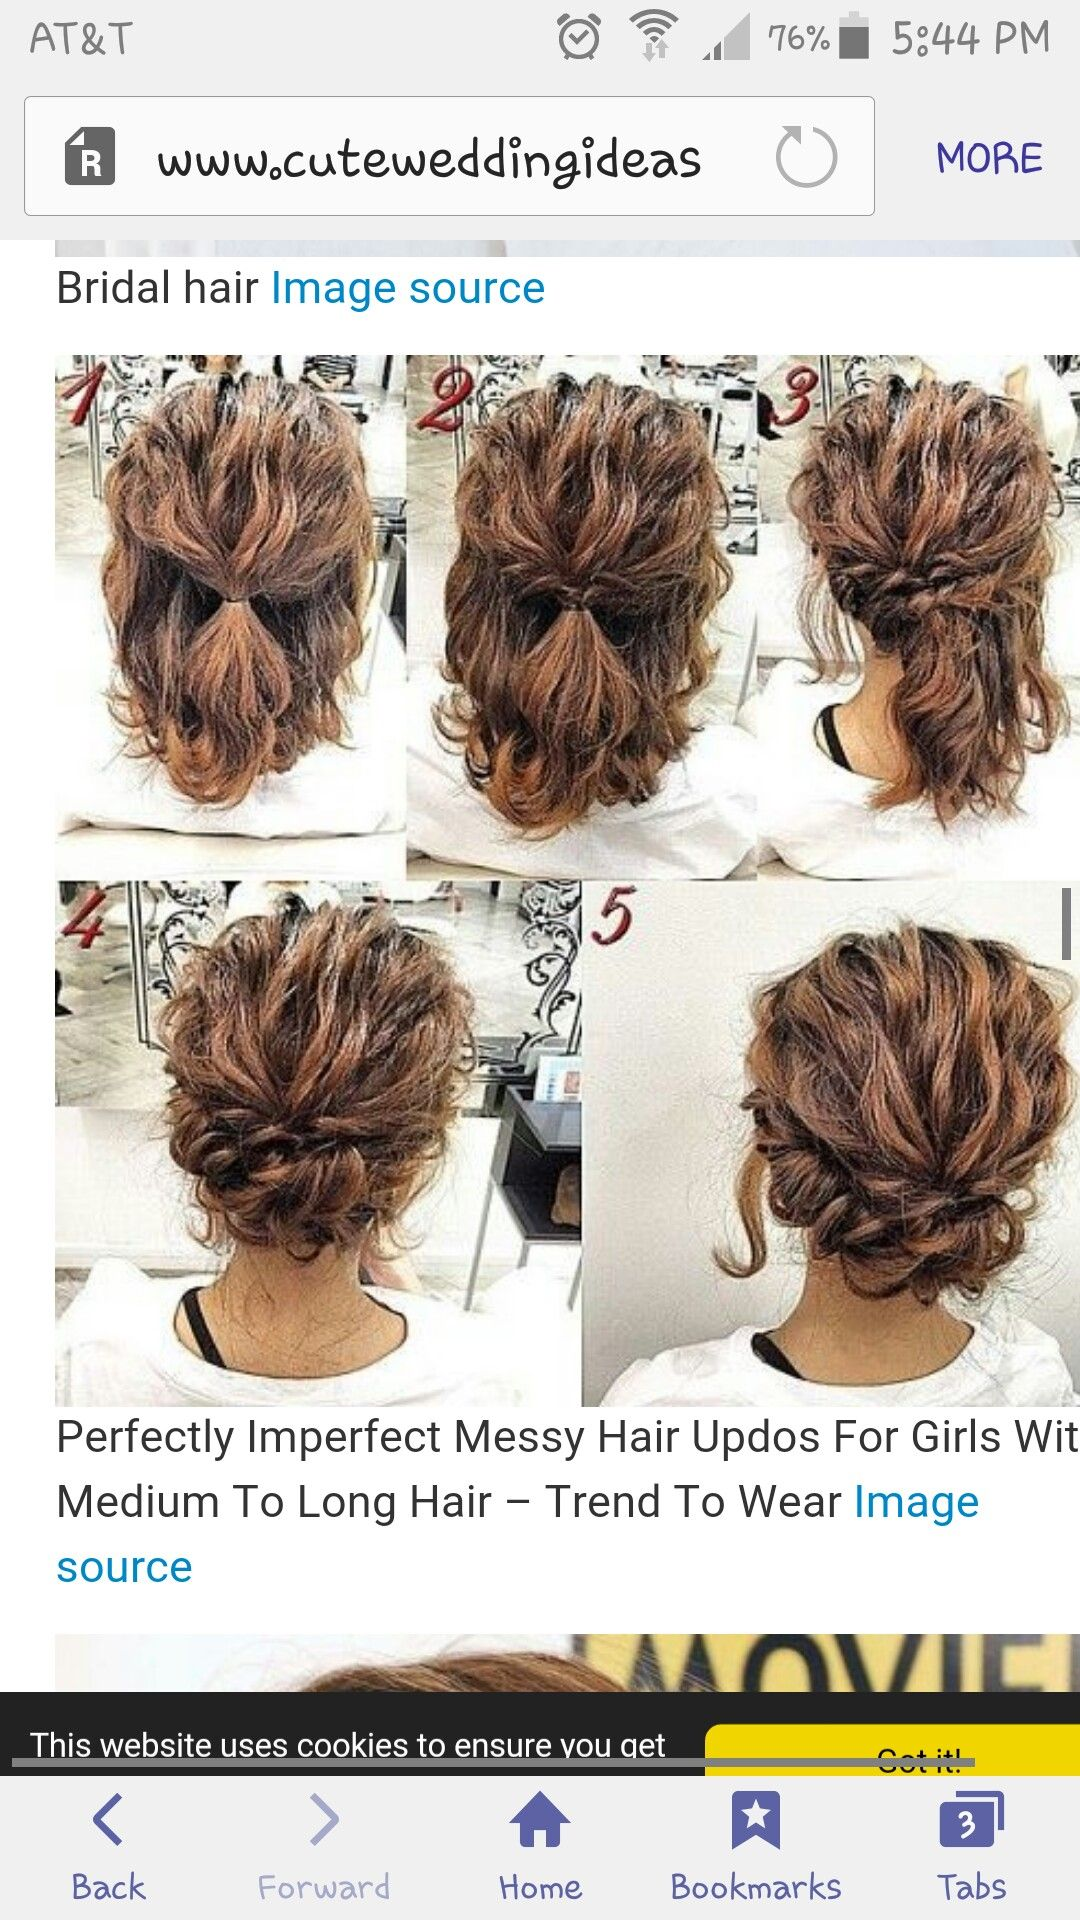 Pin by Sierra Dodge on wedding hairstyles | Pinterest